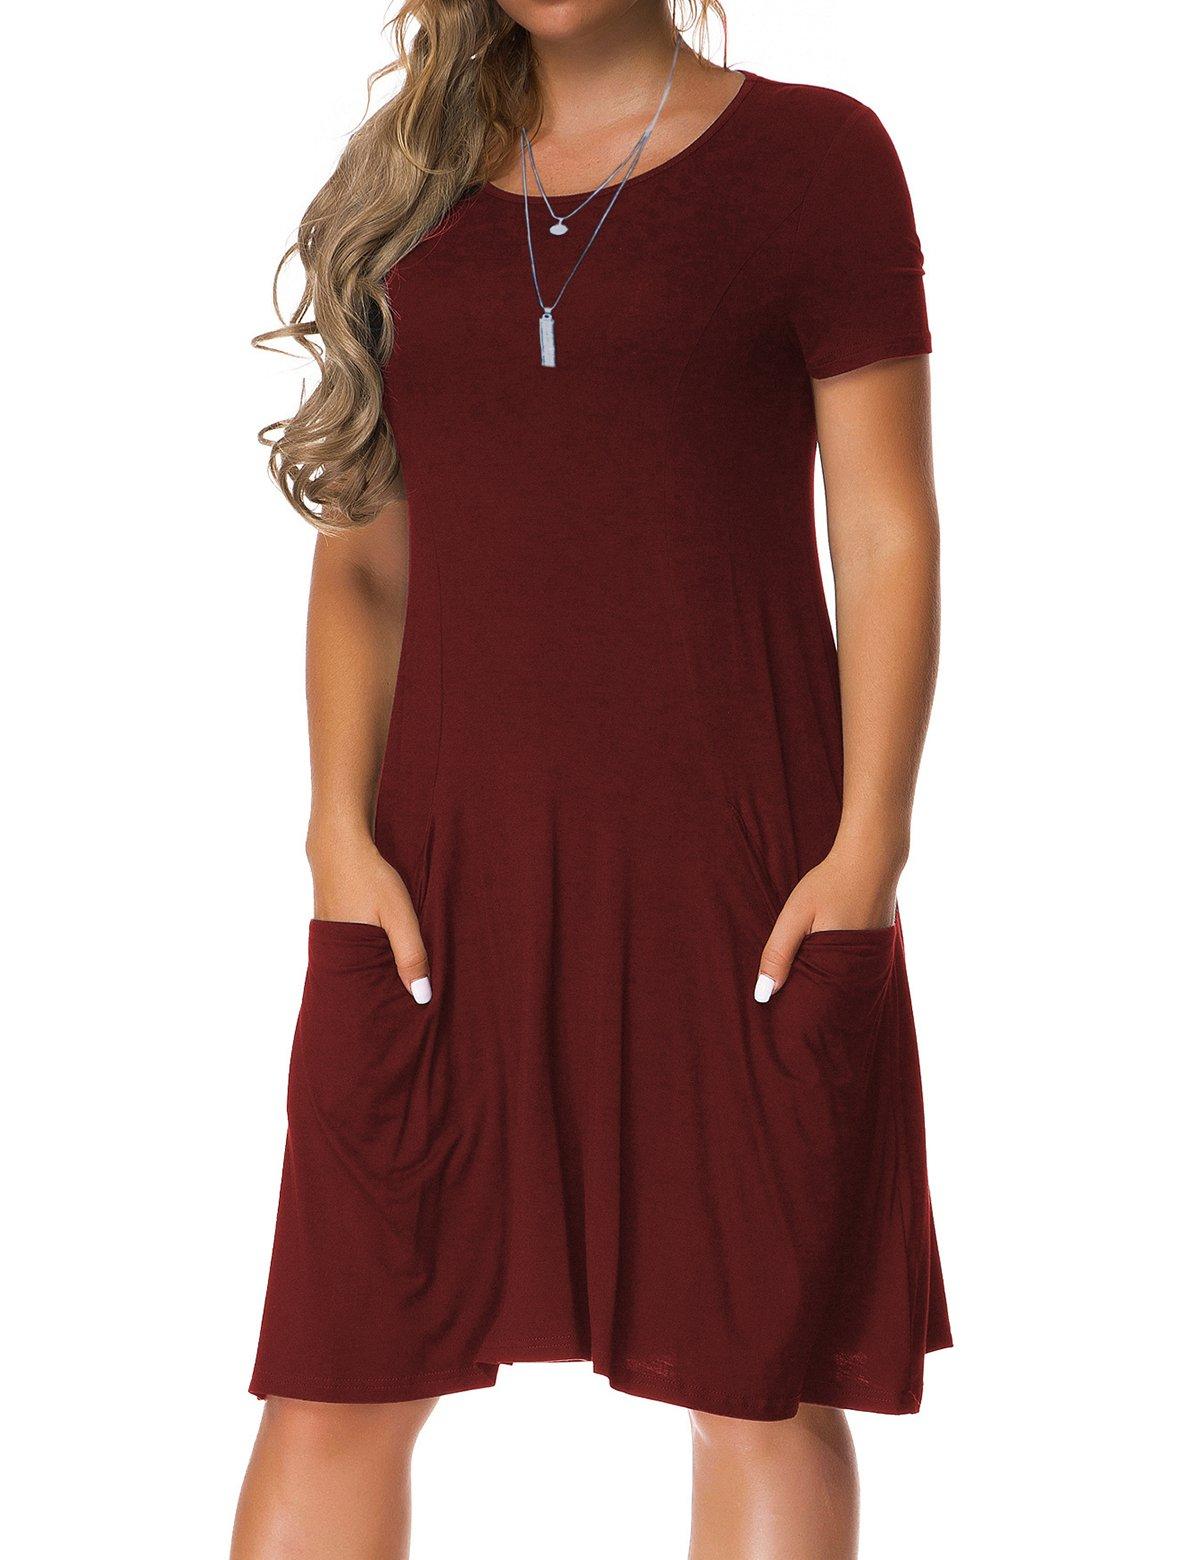 VERABENDI Women's Plus Size Short Sleeve Dress Casual Loose Pocket T-Shirt Dress Burgundy M